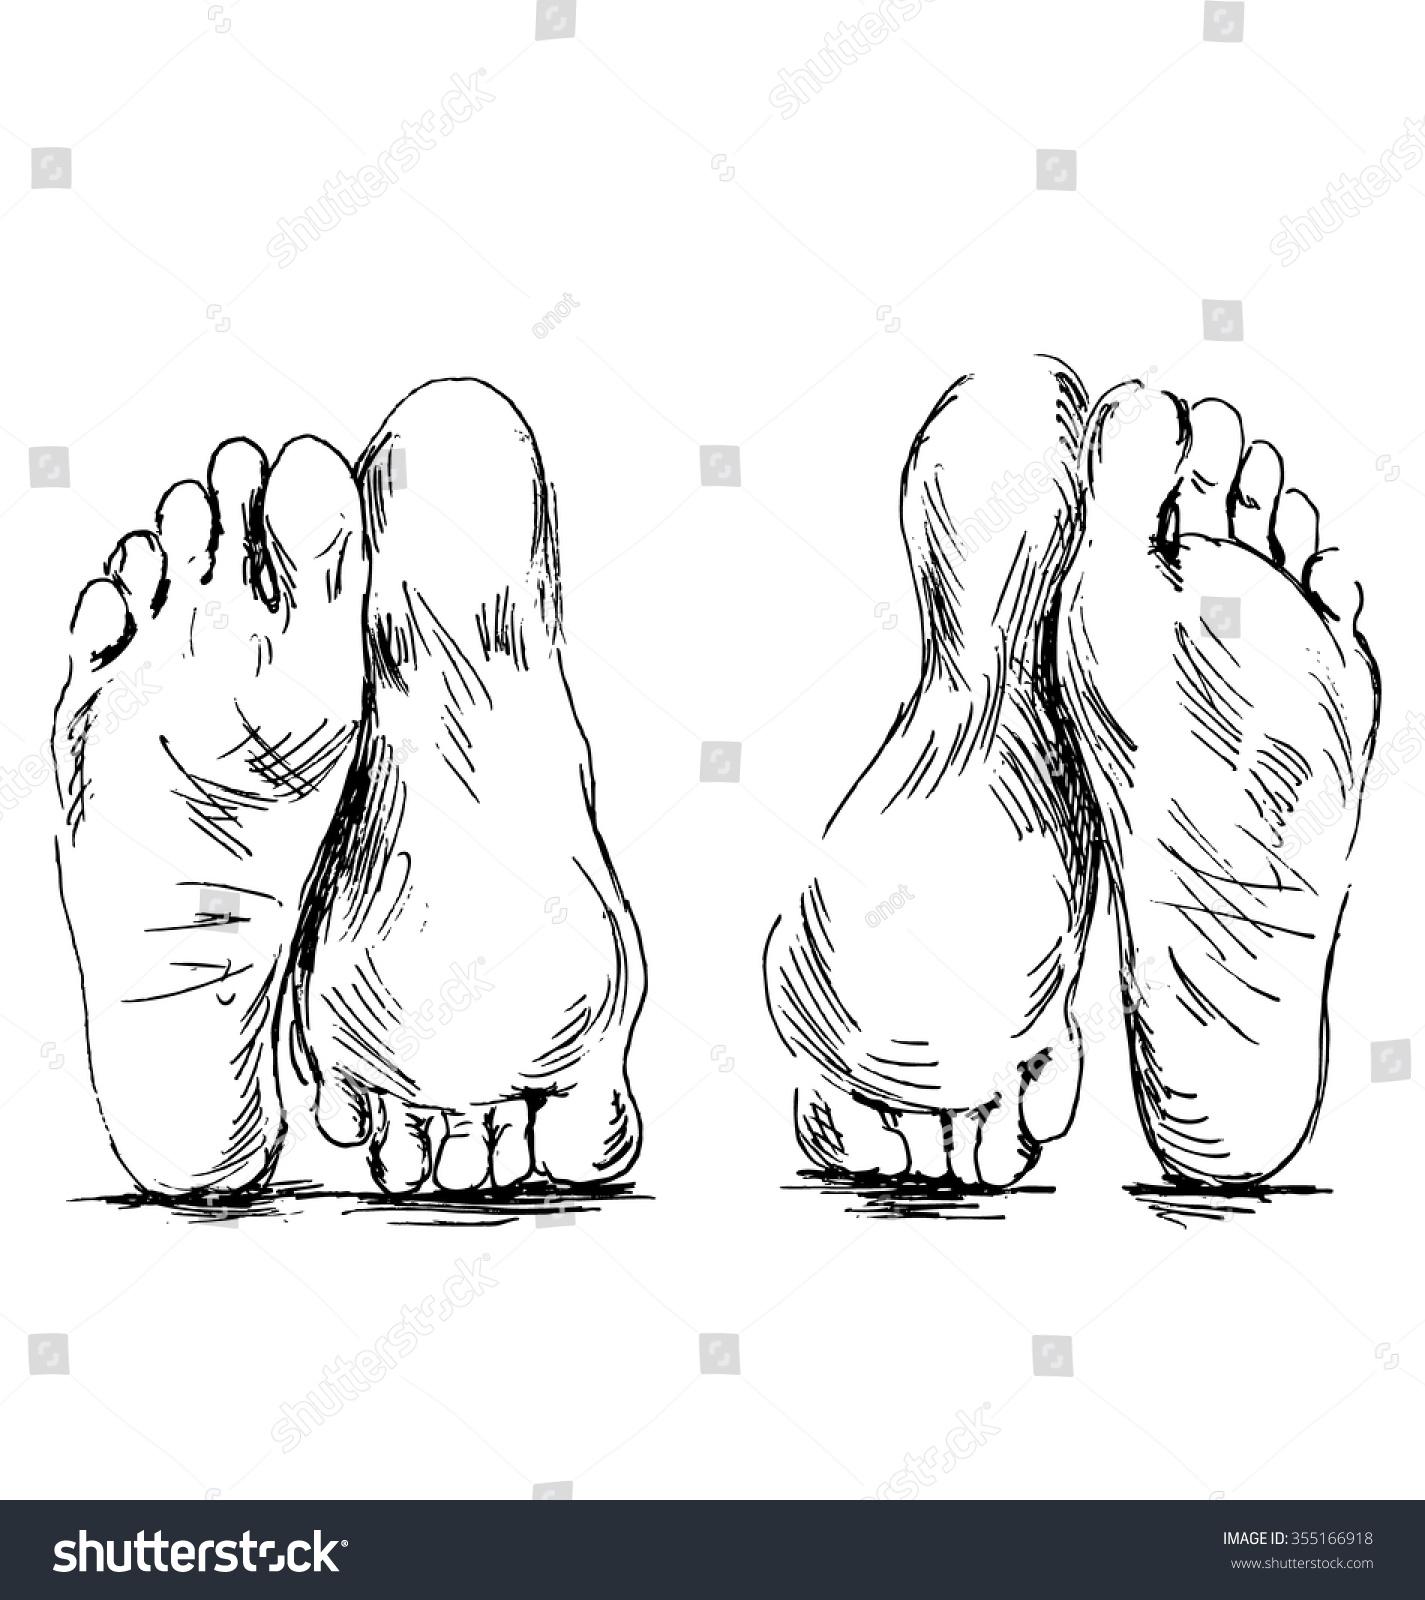 Hand sketch couple of feet having sex 355166918